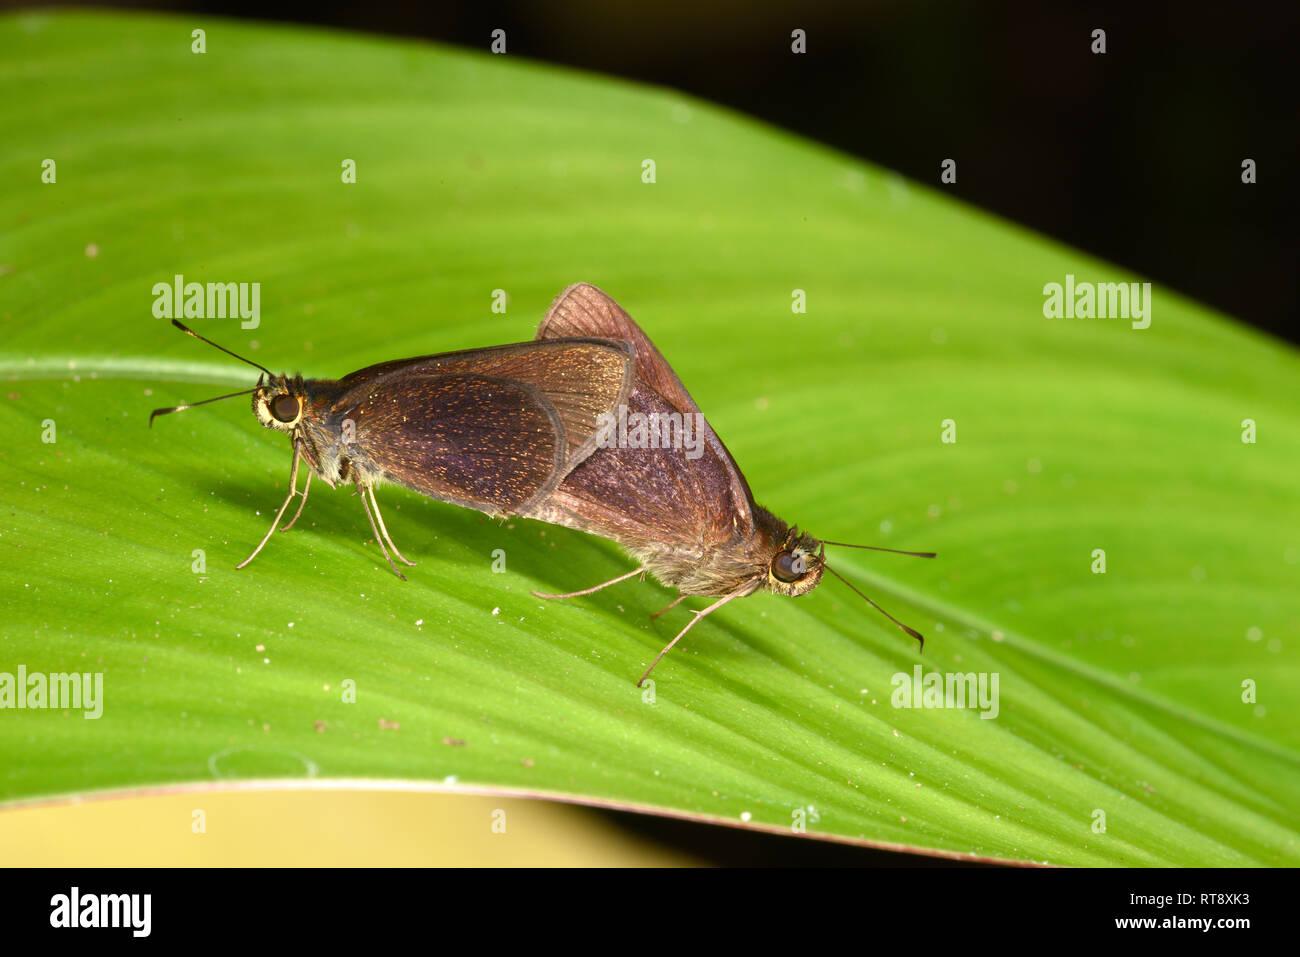 Velada Skipper Butterfly (Eprius velada) pair mating on leaf, Soberania National Park, Panama, October Stock Photo